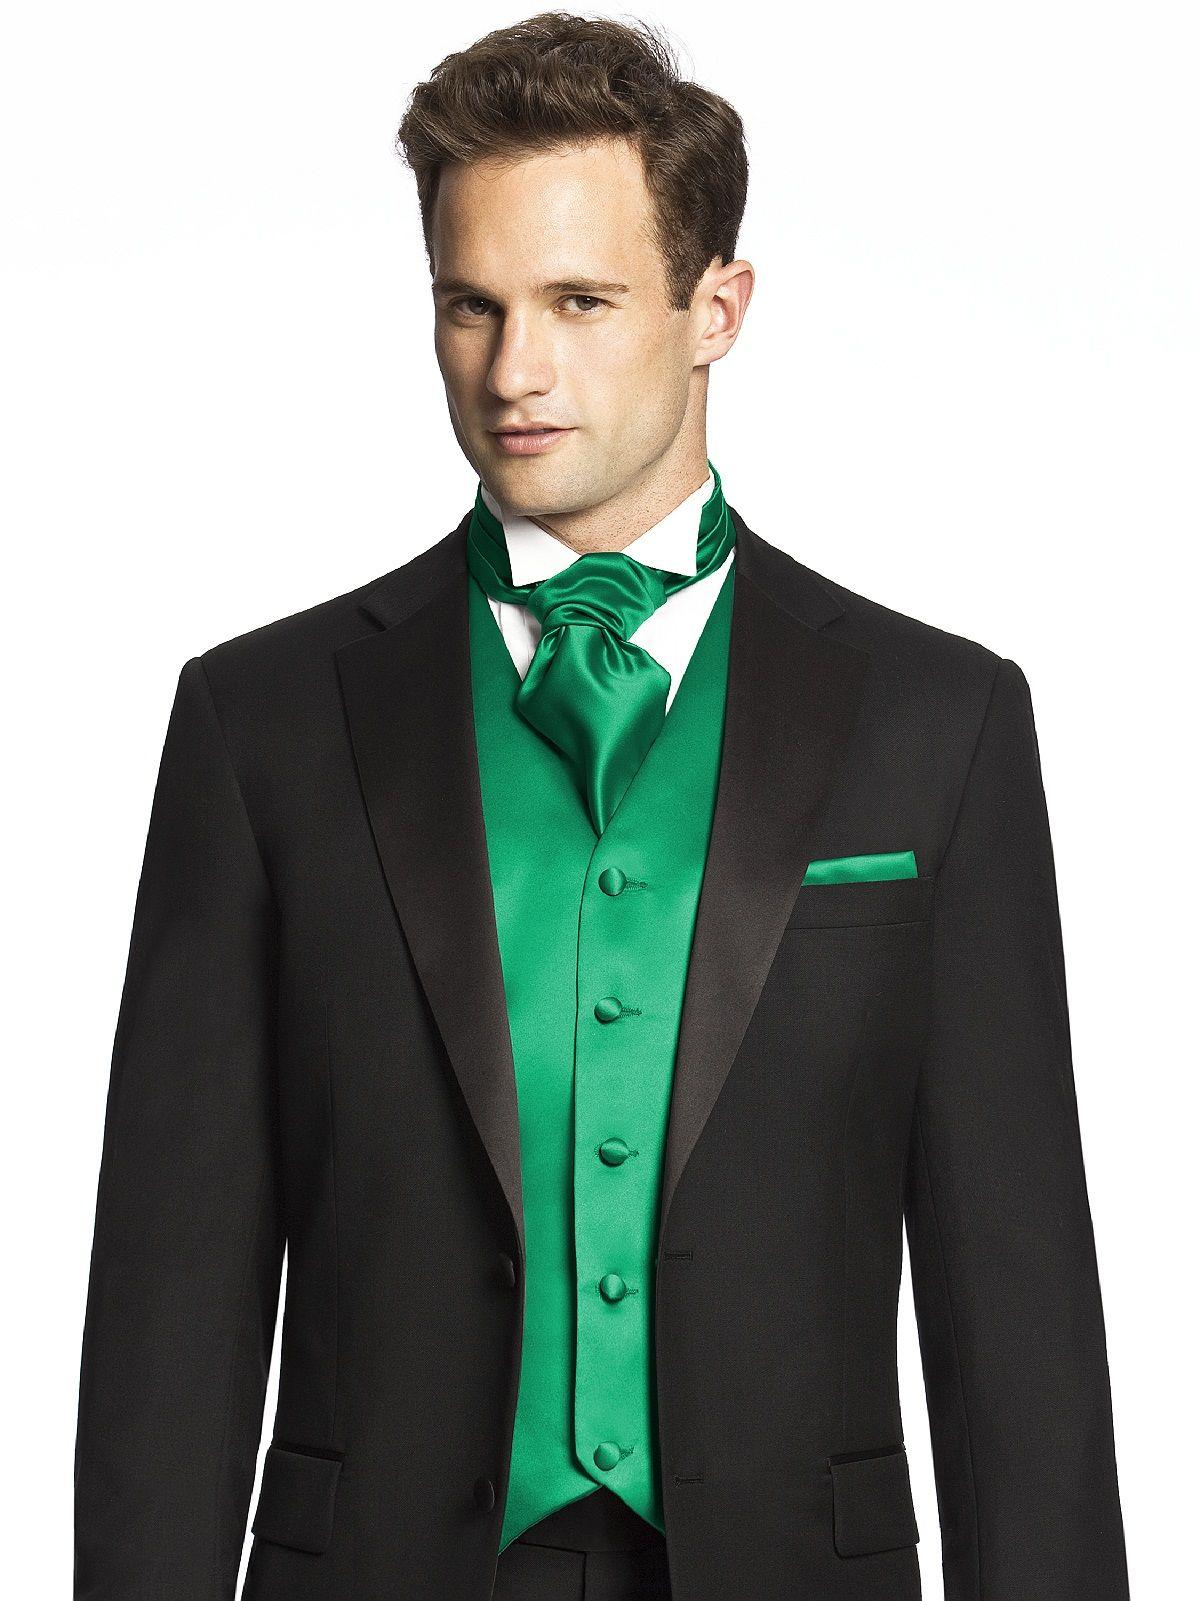 Dessy Group Custom Cravats in Duchess Satin.